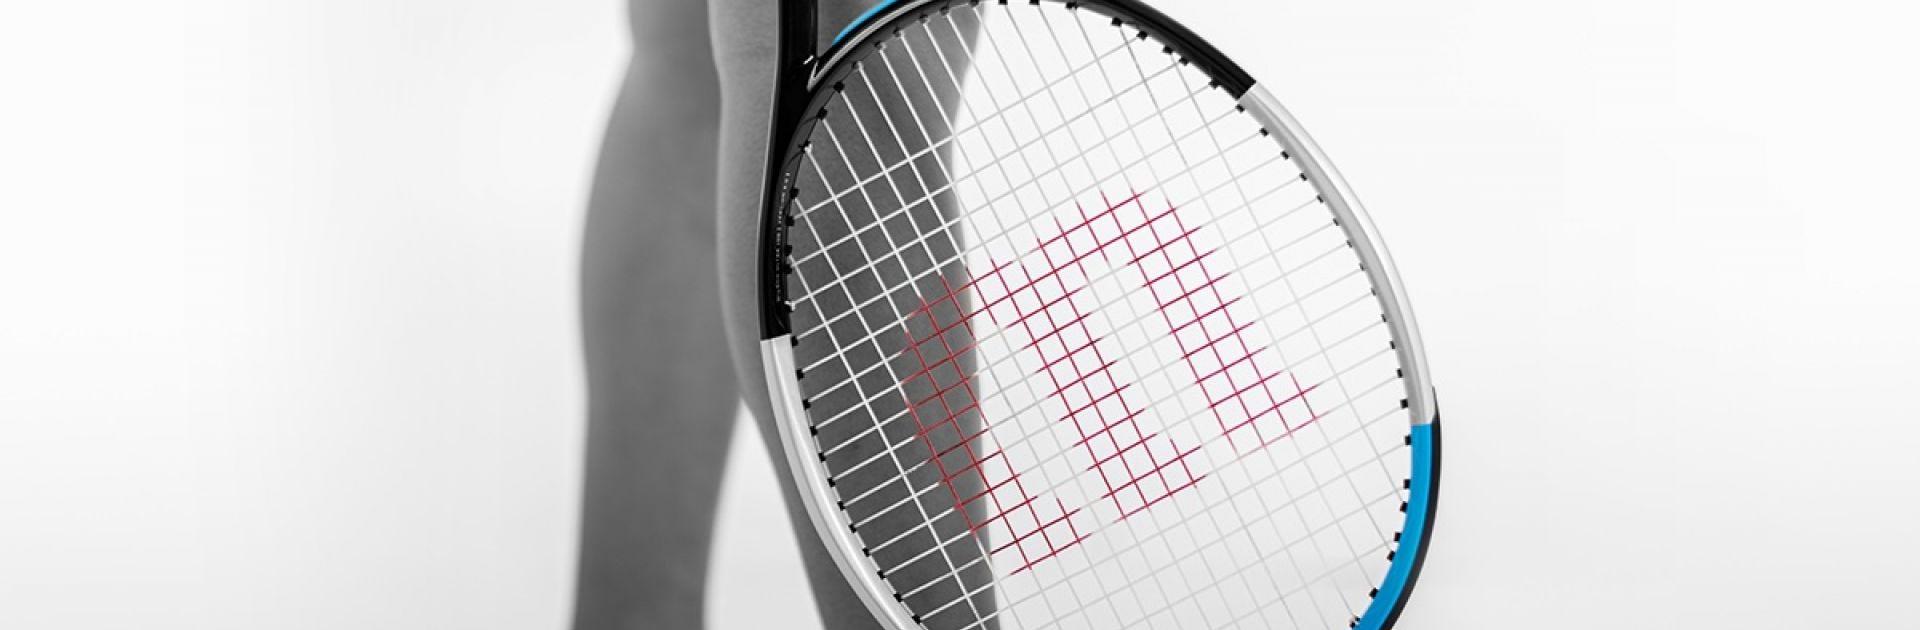 Tennis Racket Gift